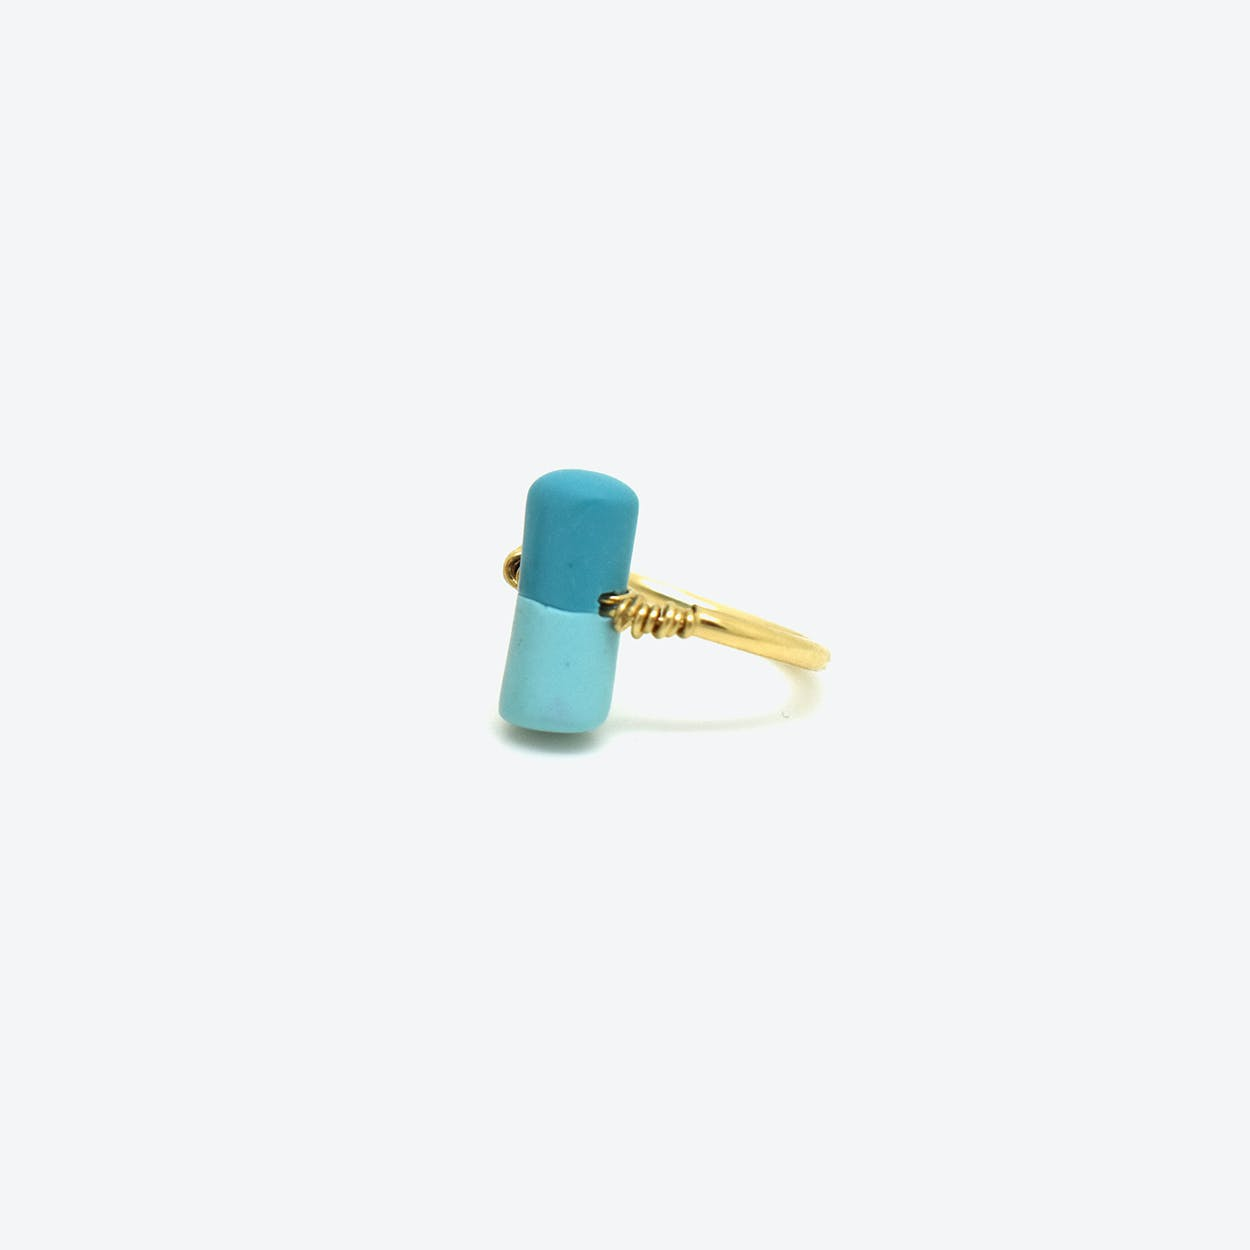 Pain Killer Ring - Turquoise